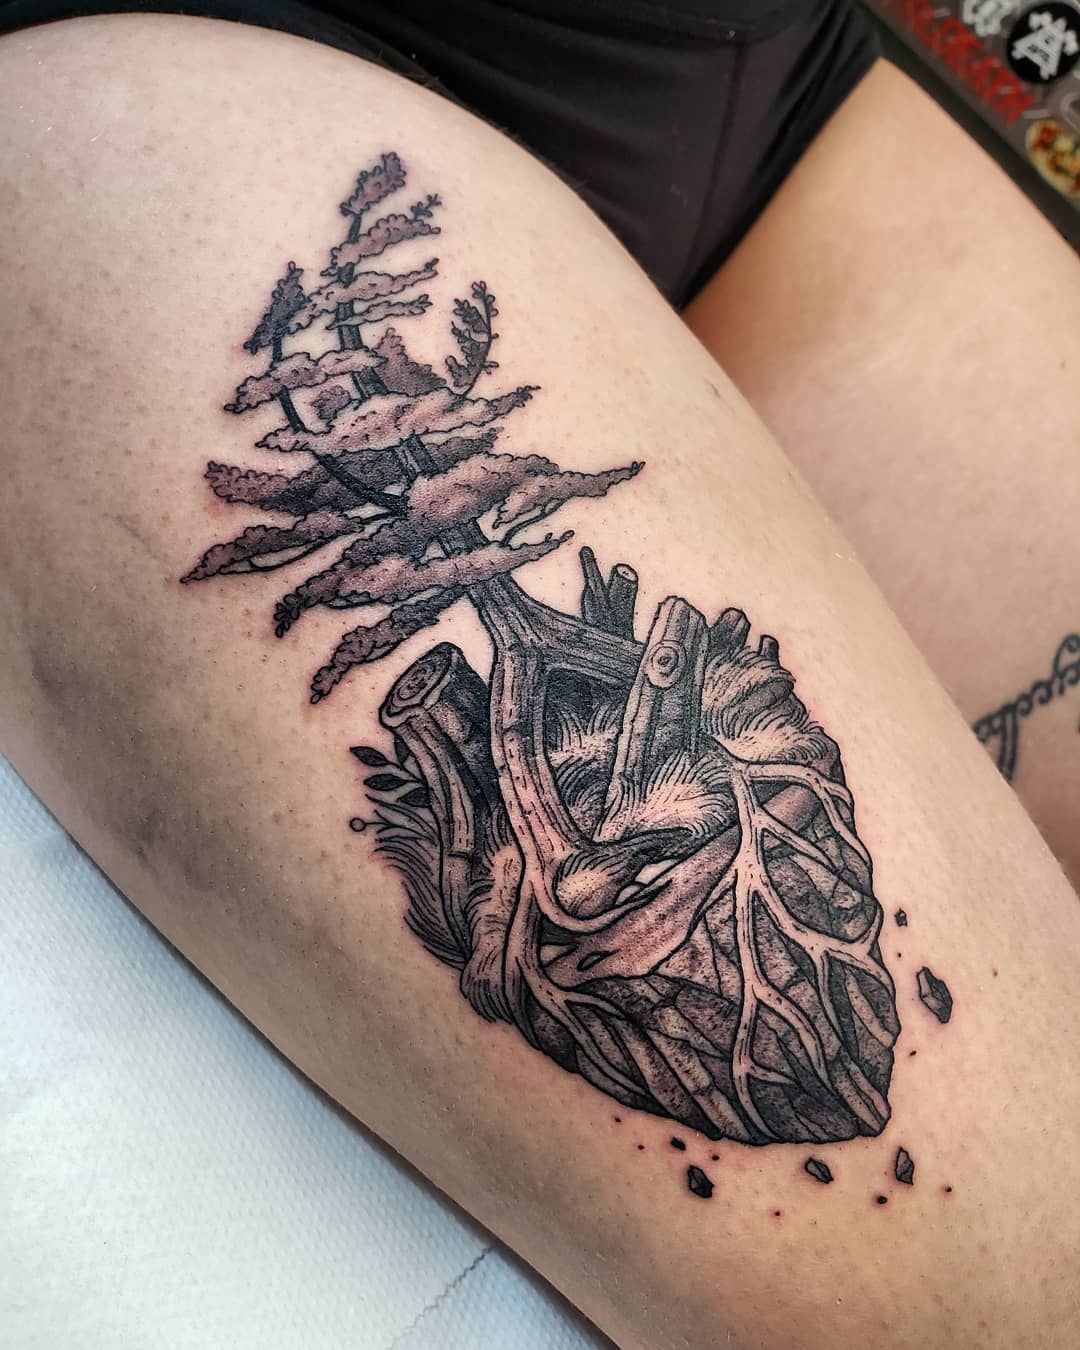 68d405cddf30b Simple and Easy Pine Tree Tattoo – Designs & Meanings (2019) tattoos,tattoos  for women,tattoos for guys,tattoos for women small,tattoos for women half  ...